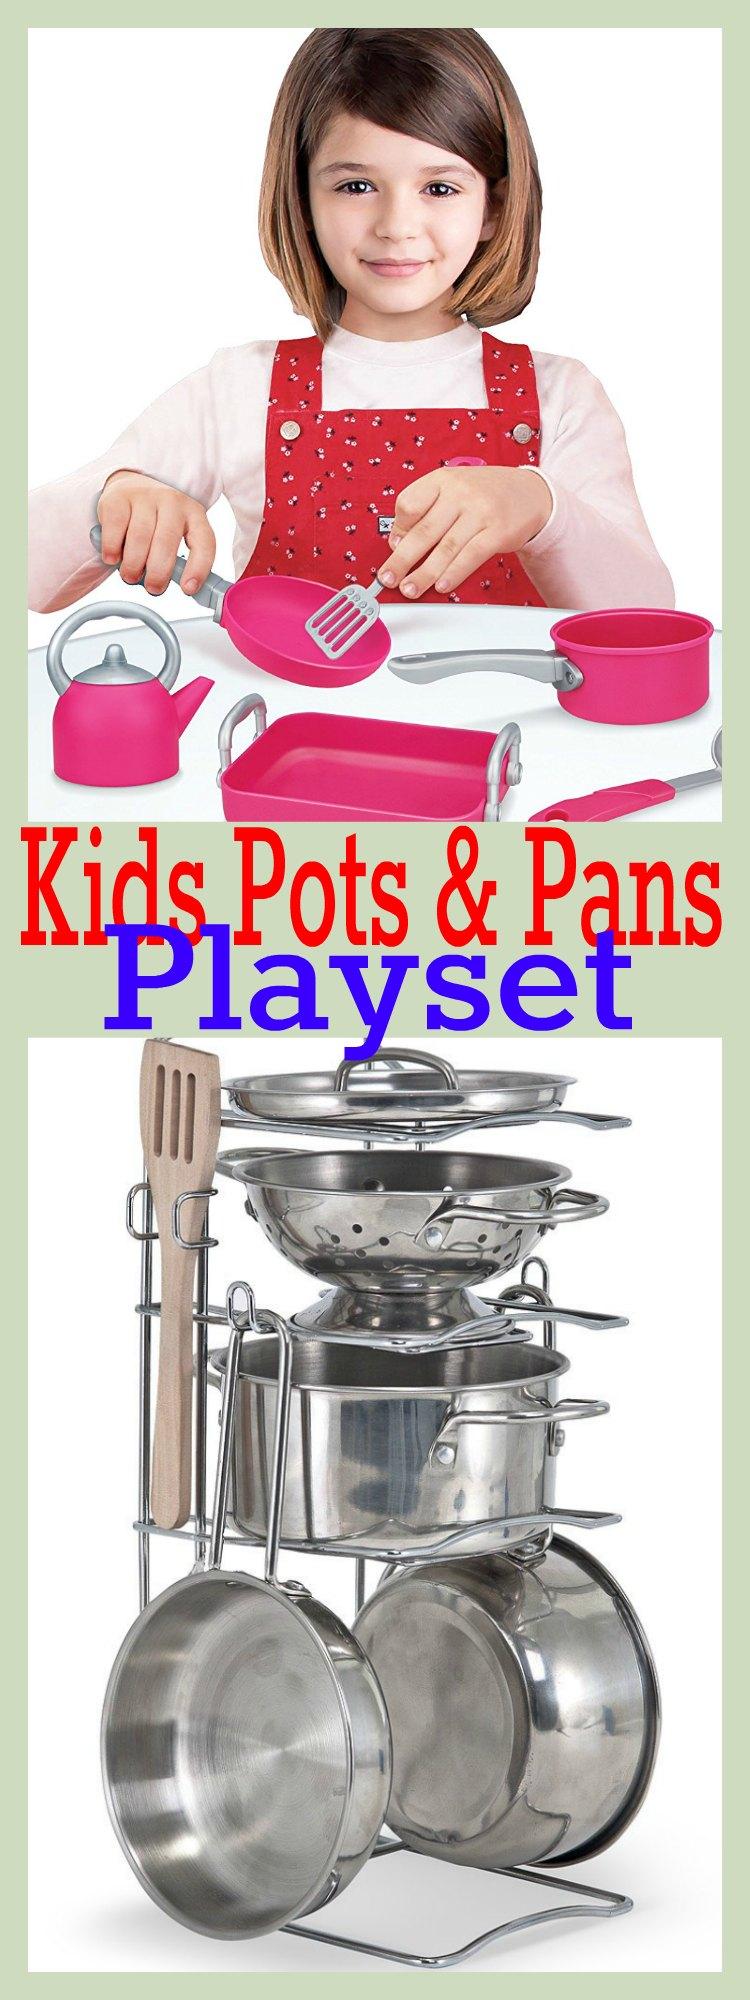 Kids Pots and Pans Playset